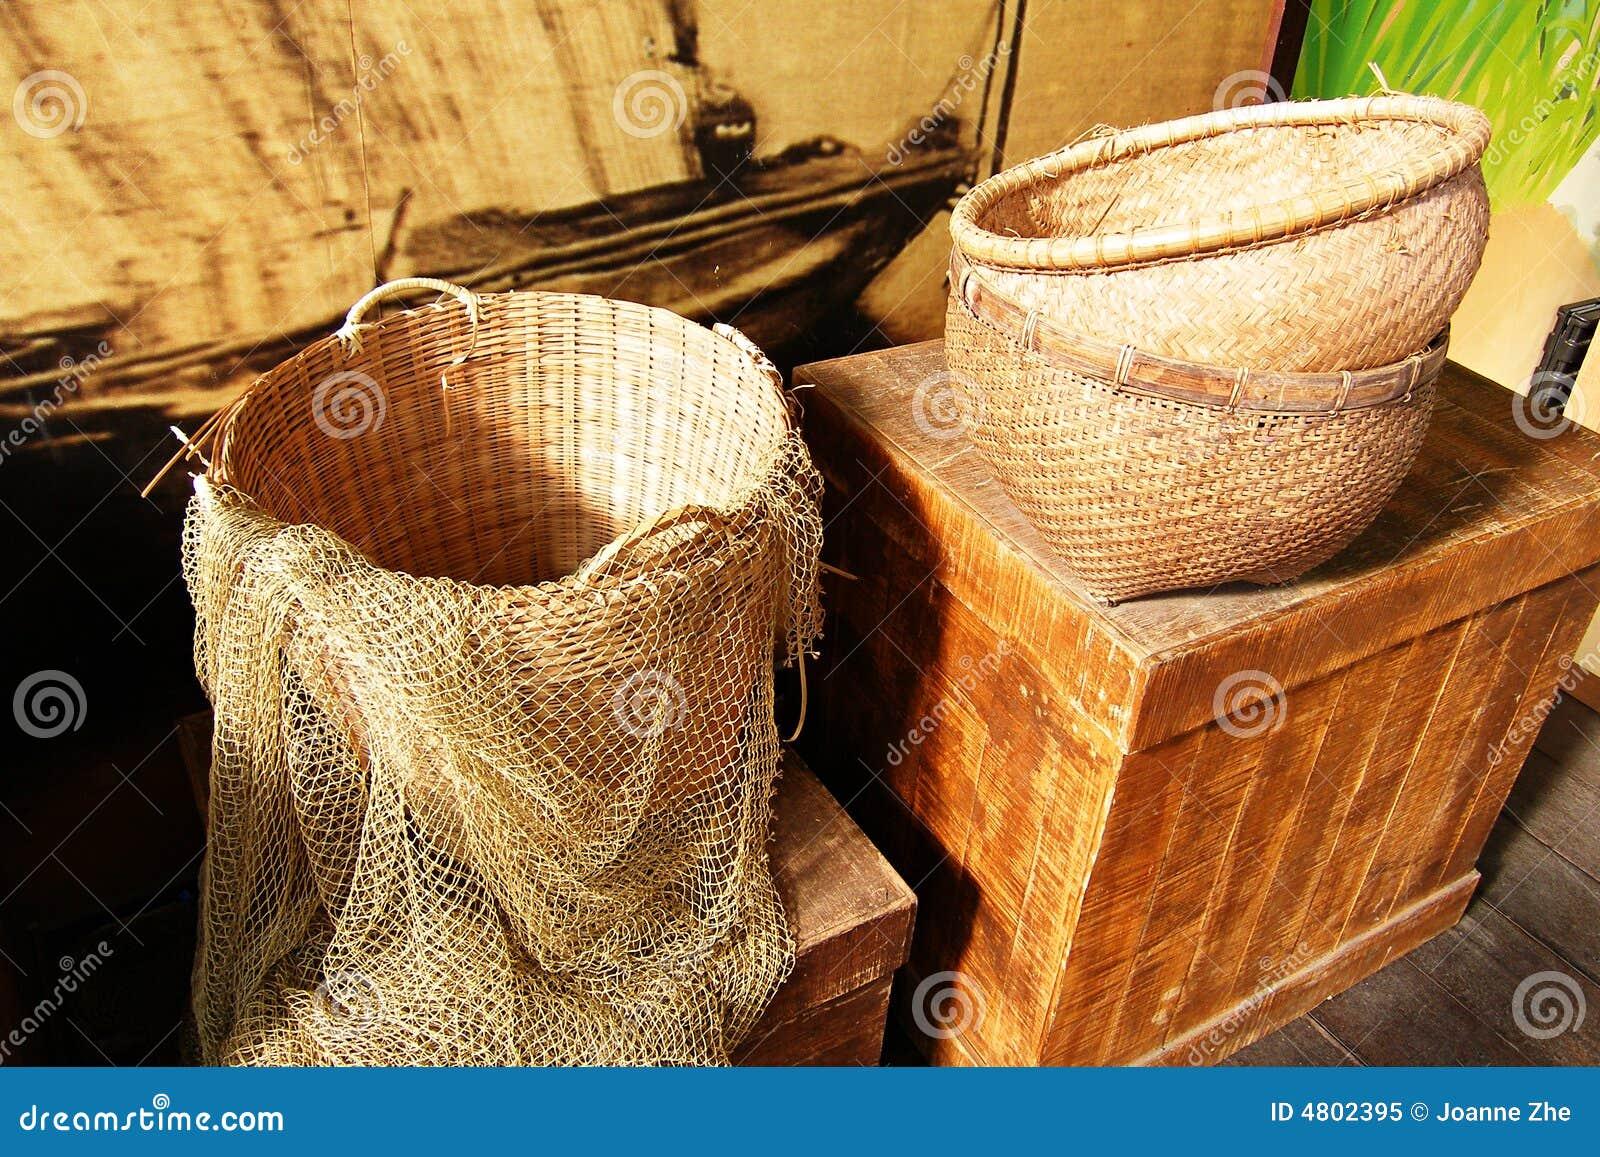 Baskets and fishing net